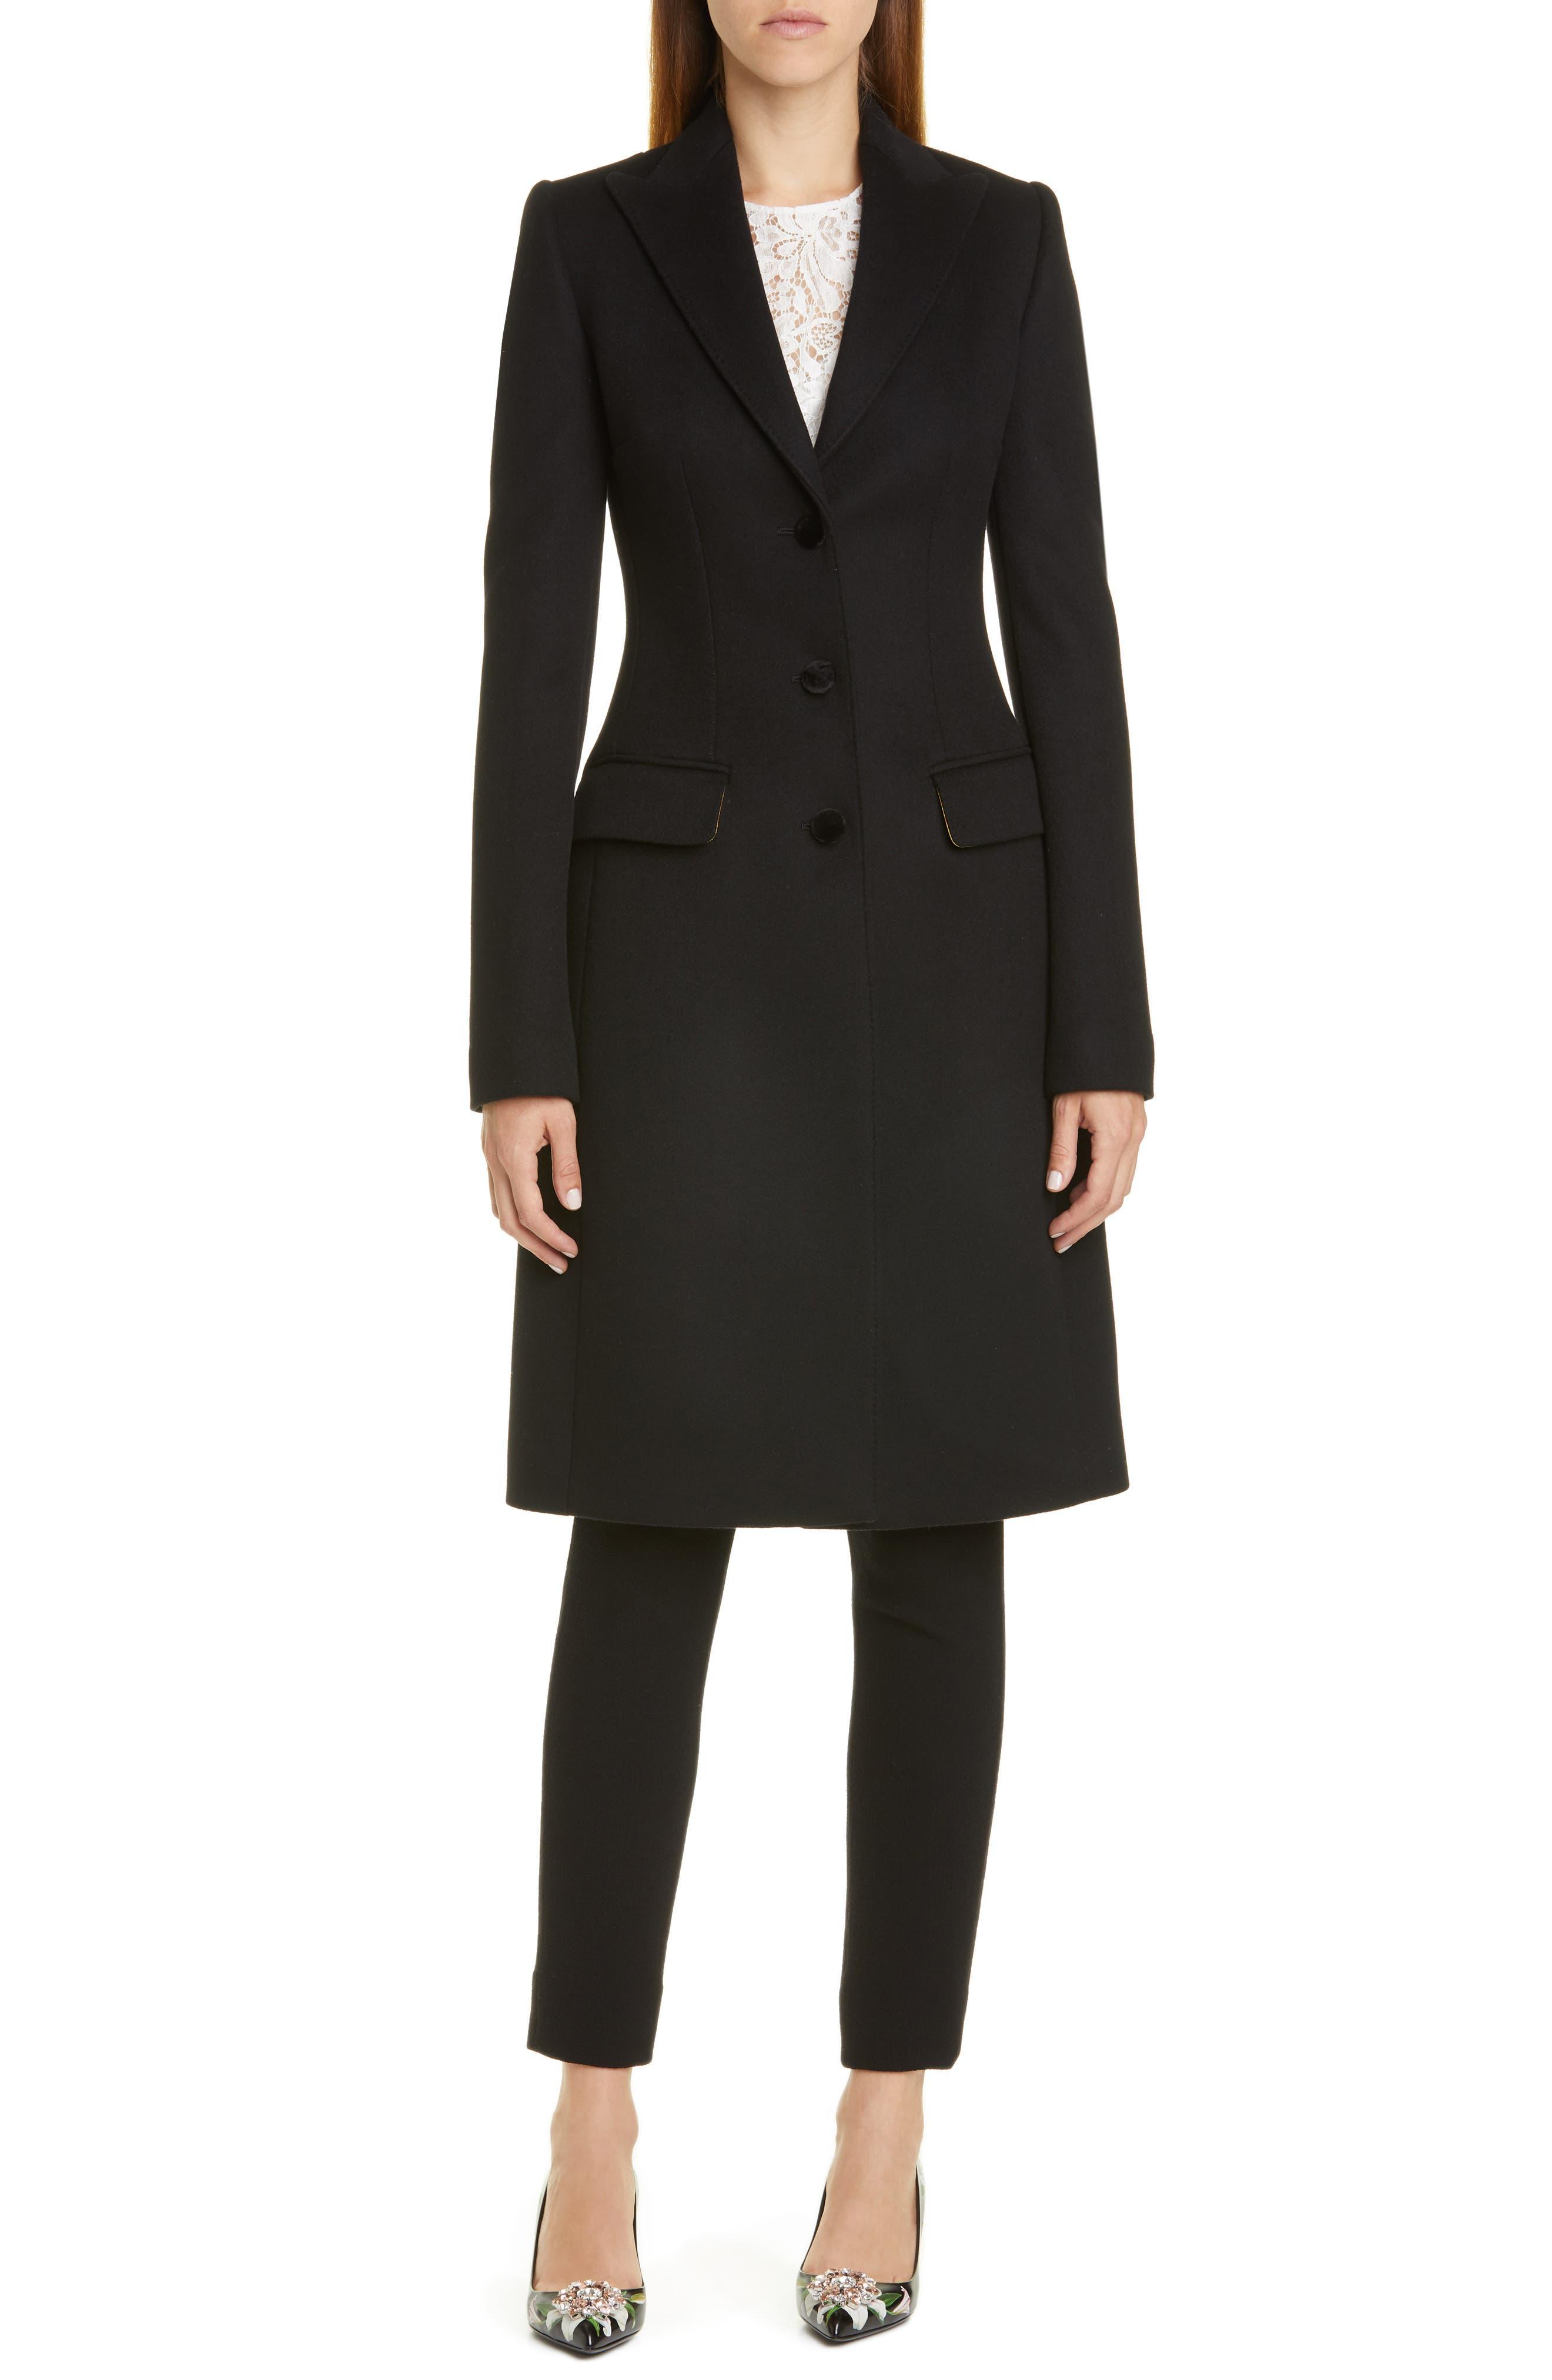 b34f98f67 Women's Cashmere Blend Coats & Jackets   Nordstrom